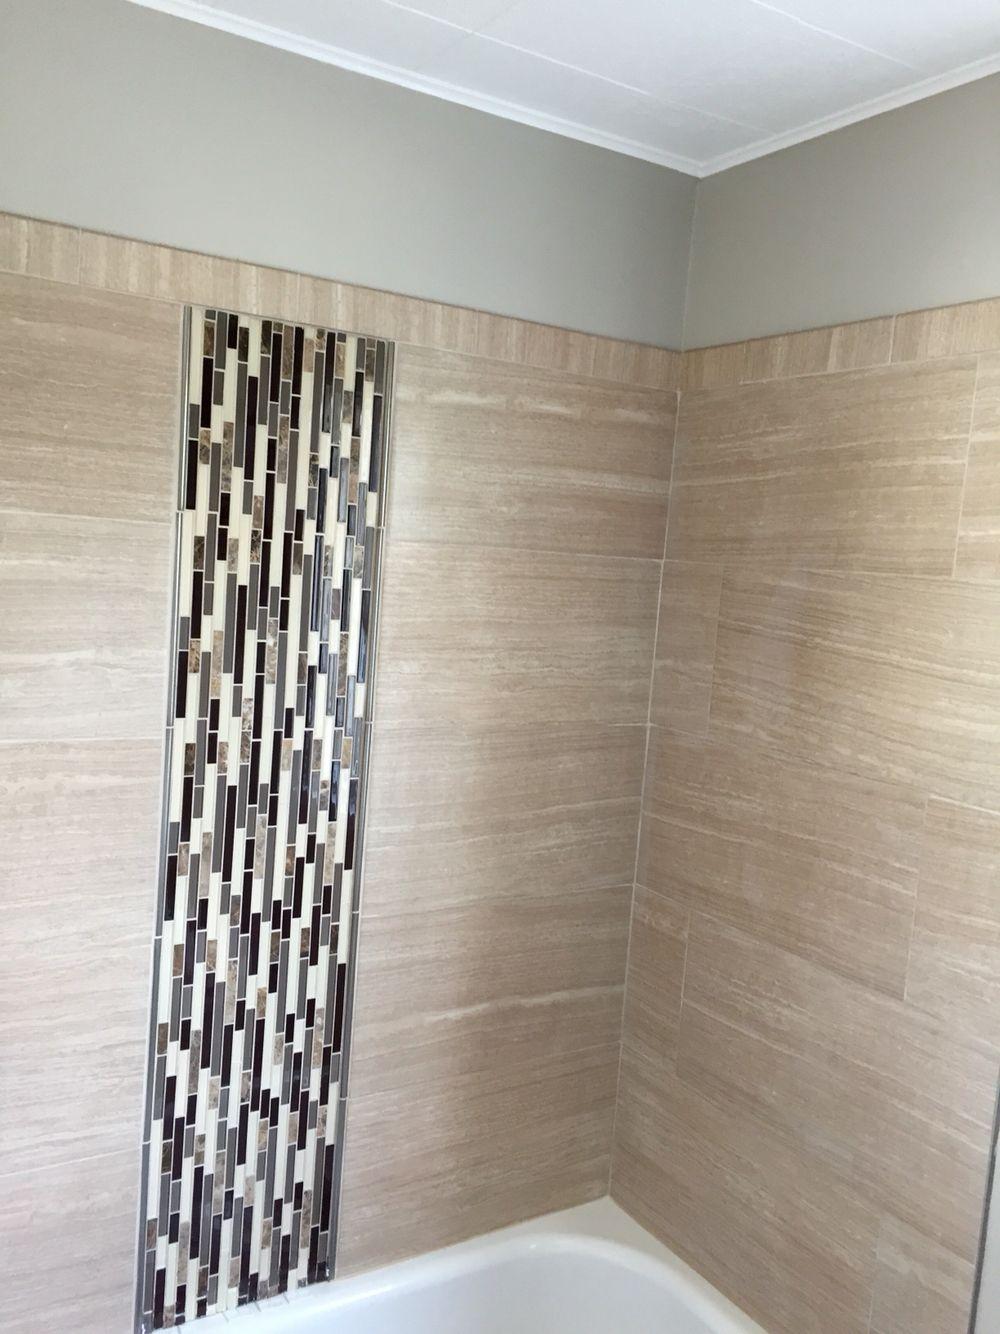 Leonia Sand Bathroom Tub Surround 12x24 Bathroom Tub Surround